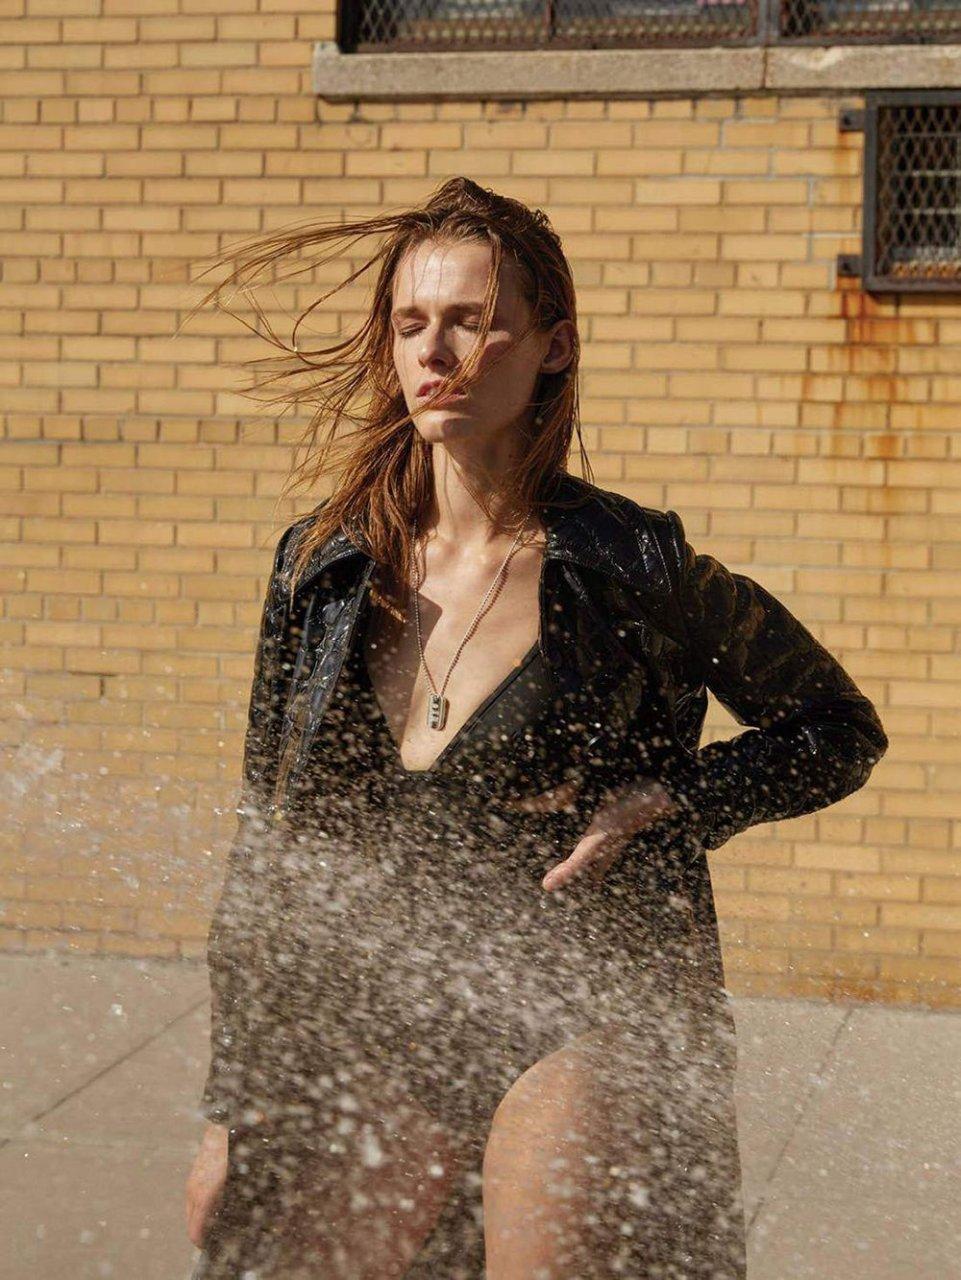 Georgia Hilmer, Emma Oak Sexy & Topless (10 Photos)